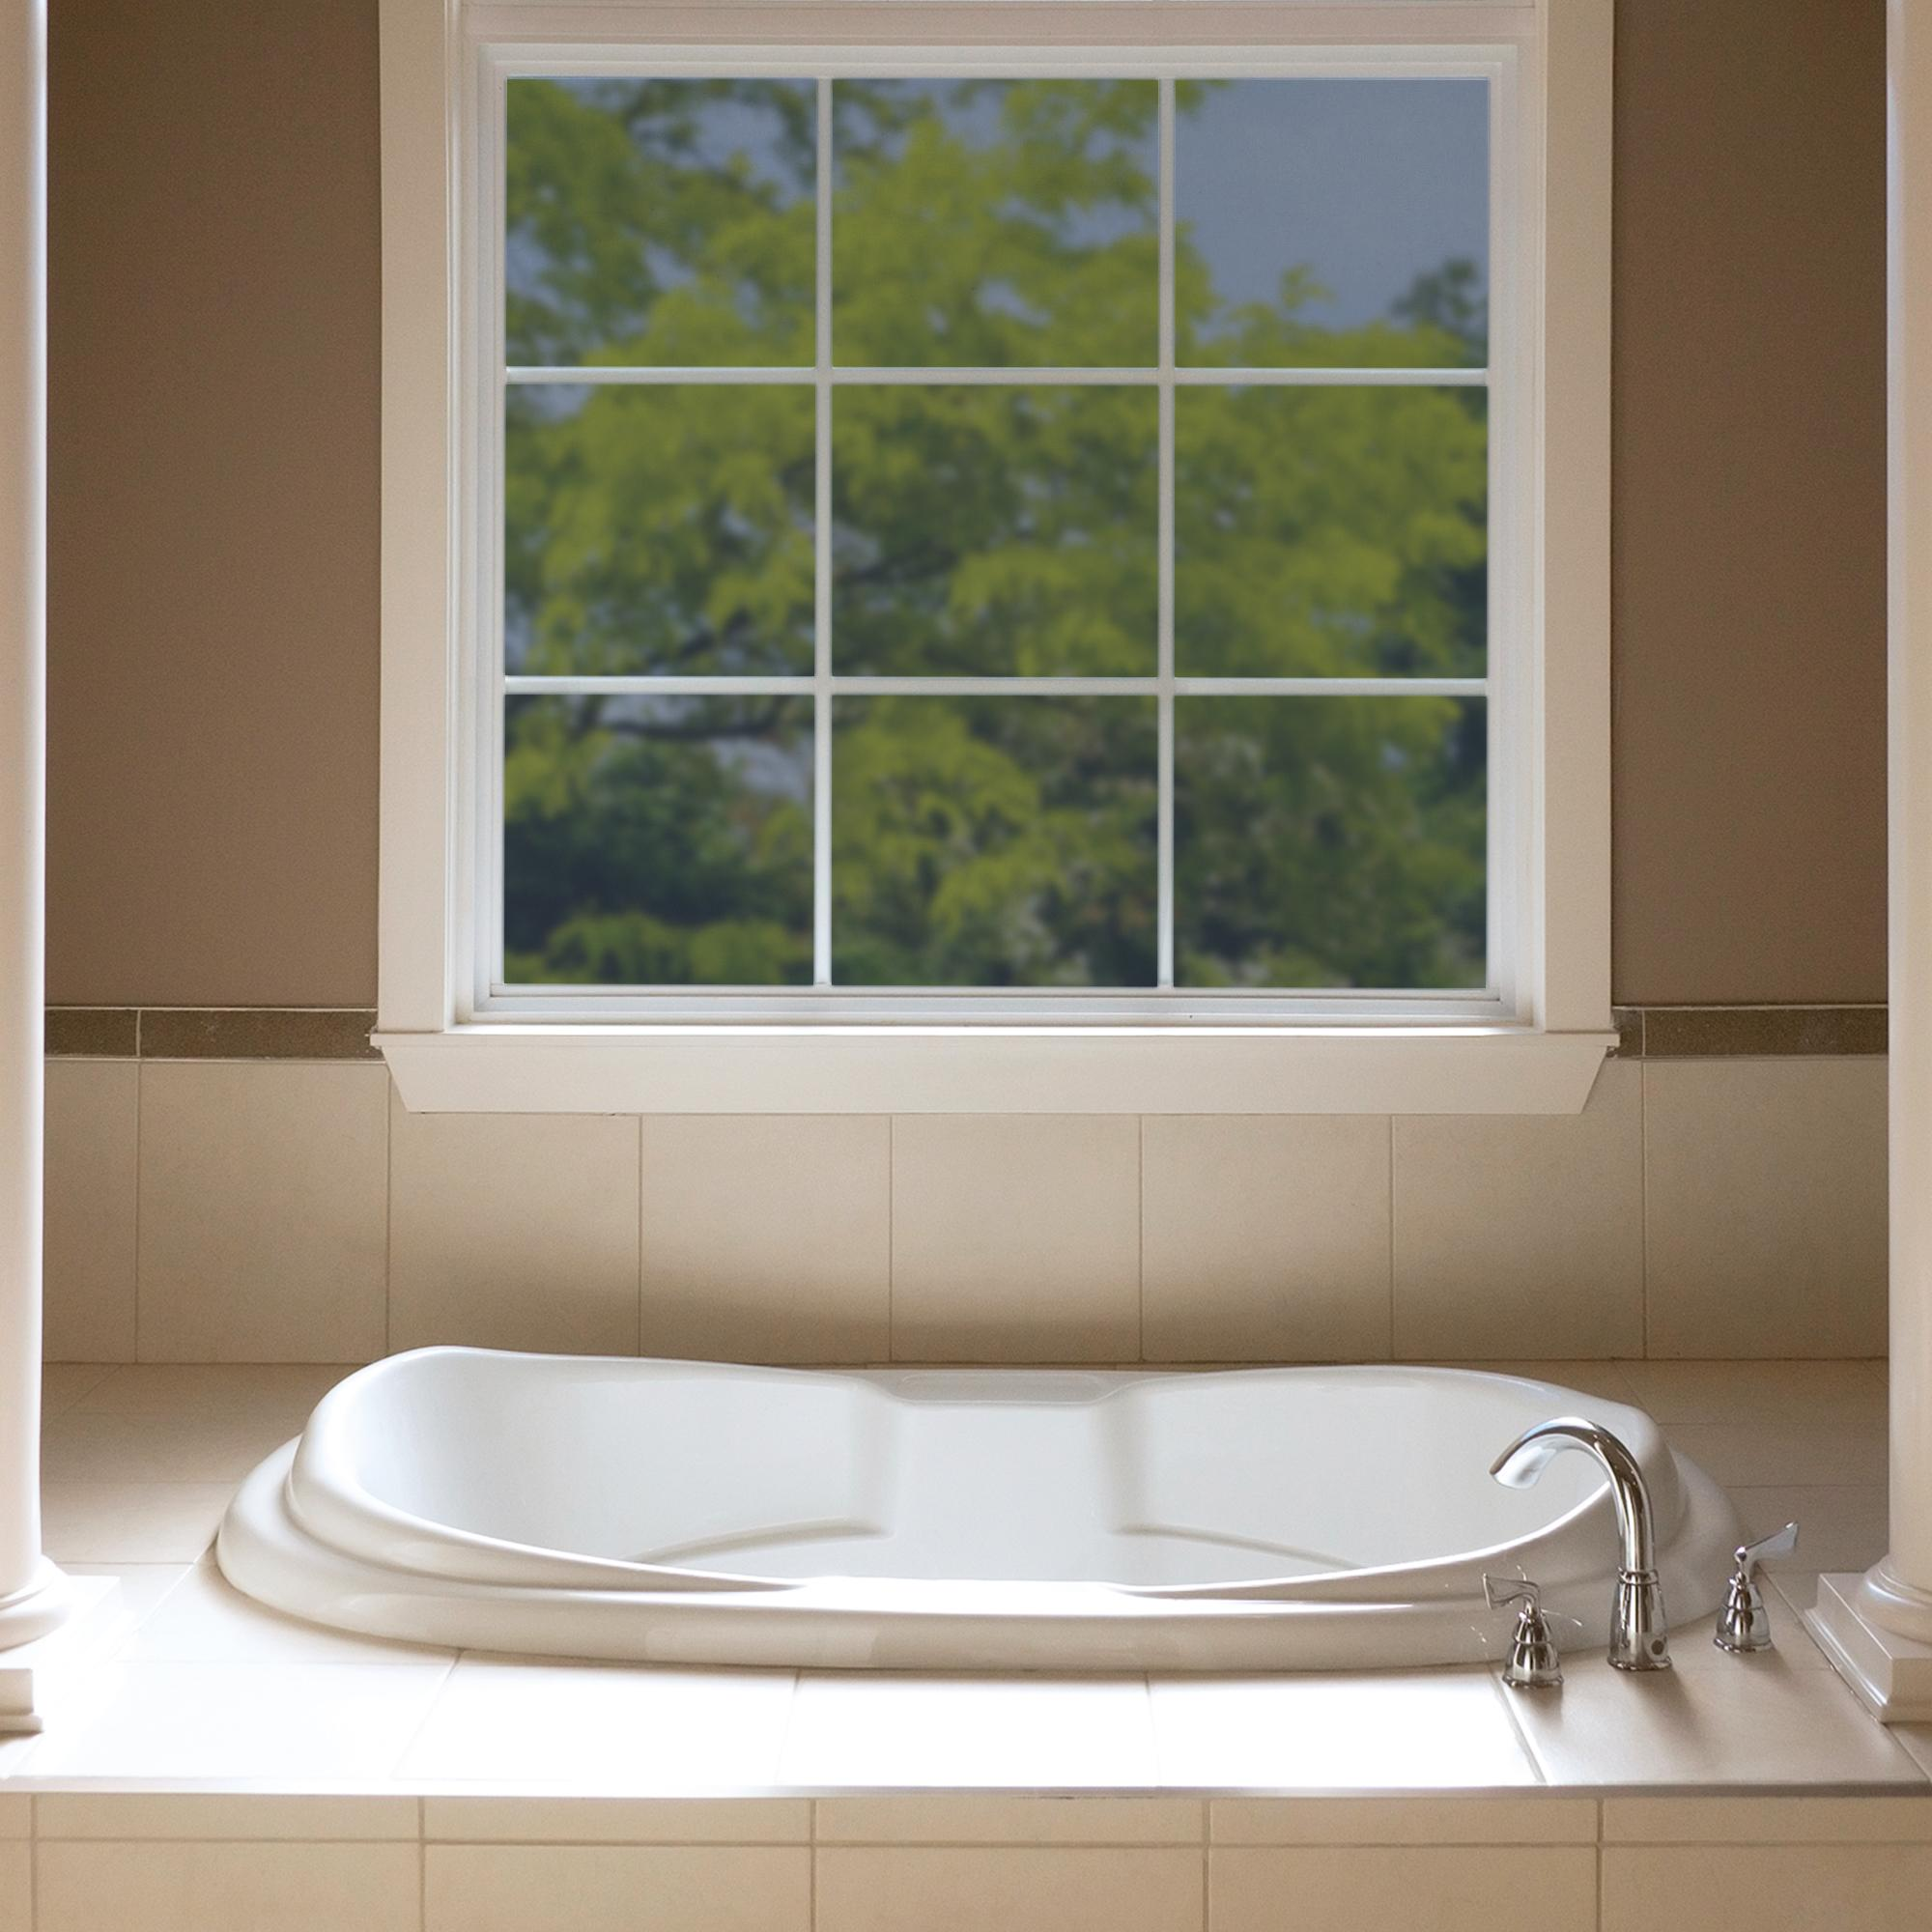 Bathroom window glass block